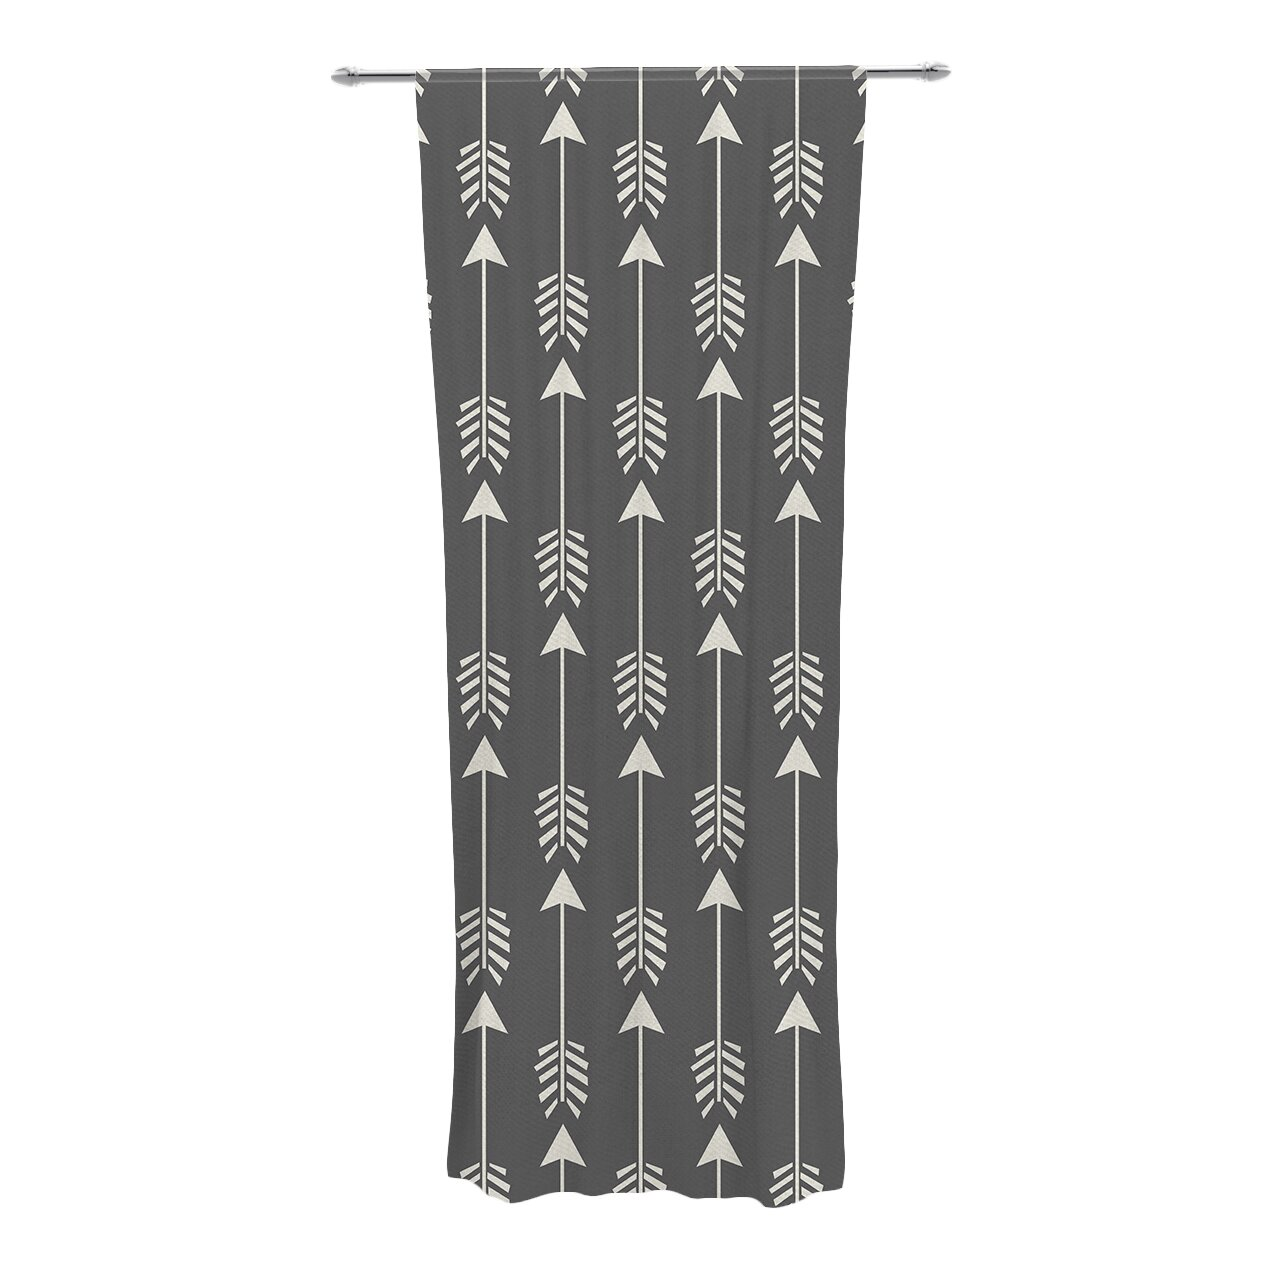 KESS InHouse Tribal Arrows Curtain Panels & Reviews